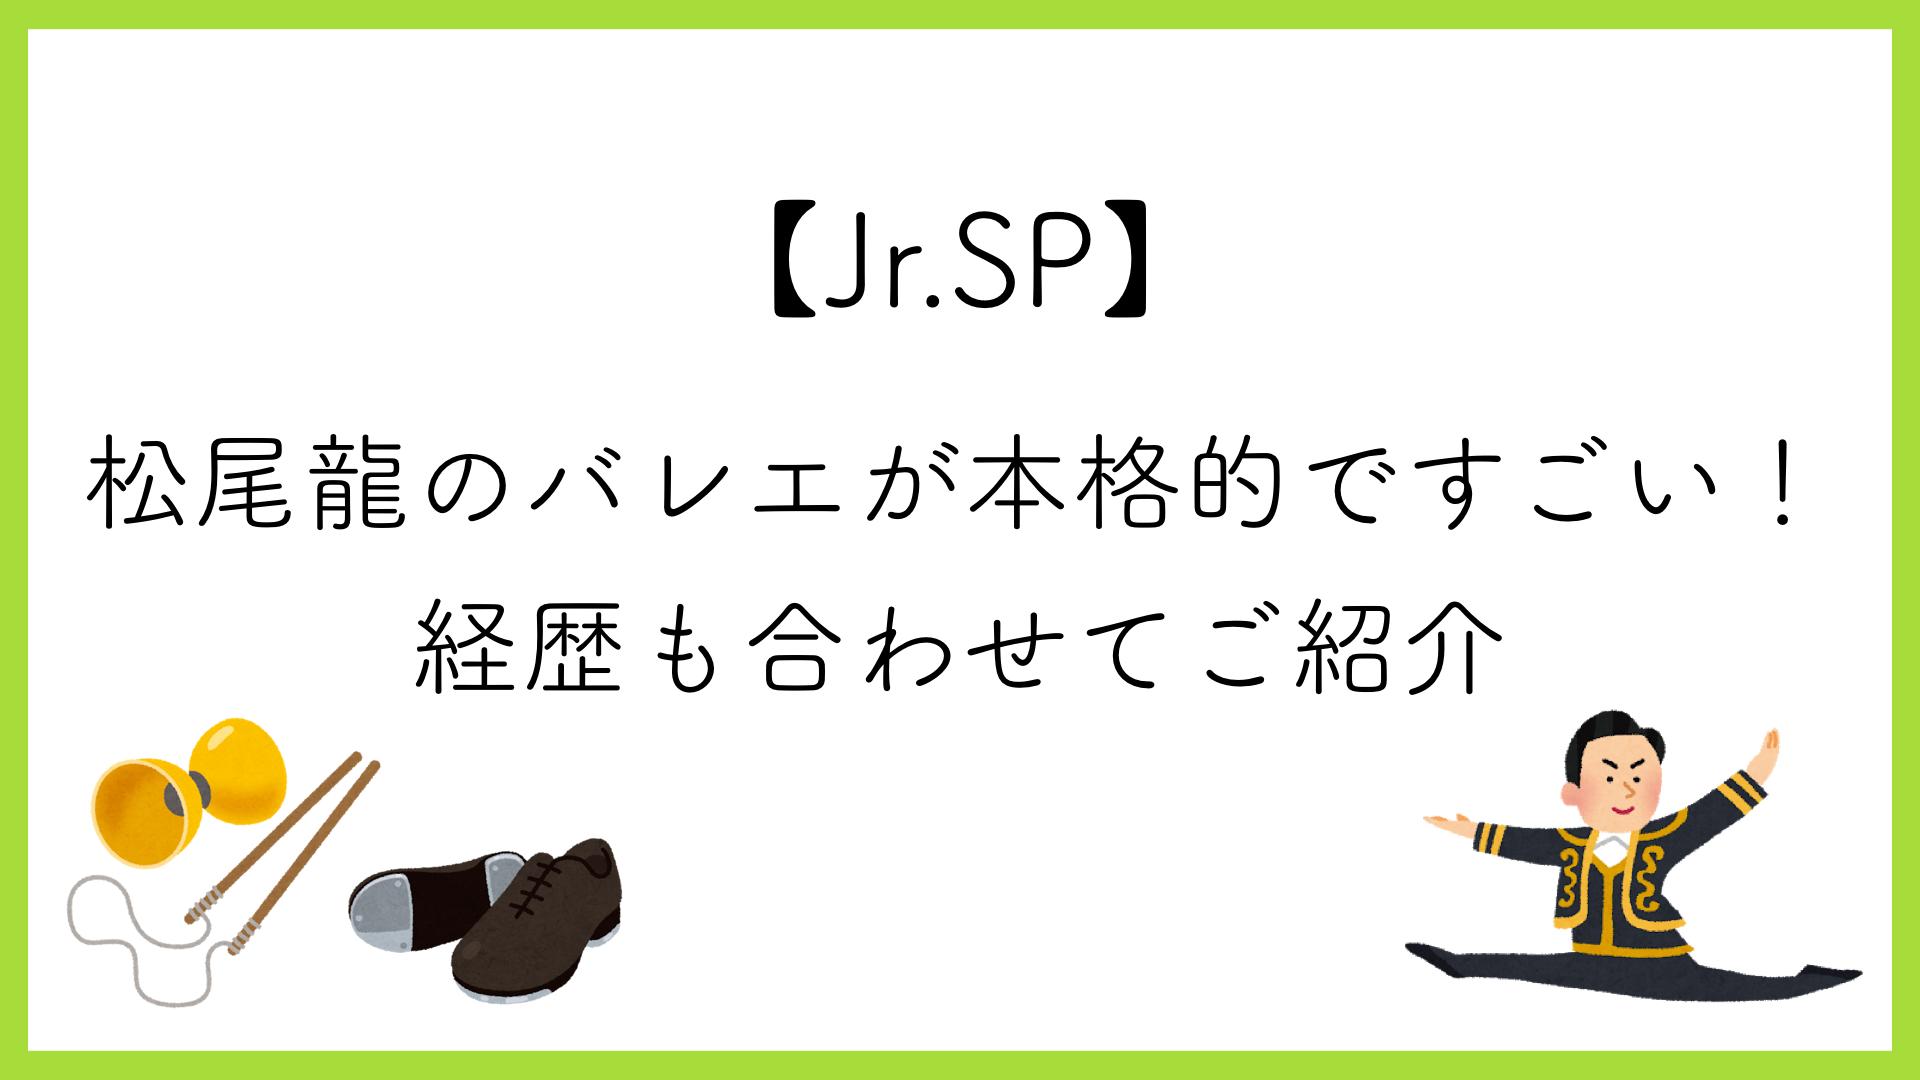 【Jr.SP】松尾龍のバレエが本格的ですごい!経歴も合わせてご紹介